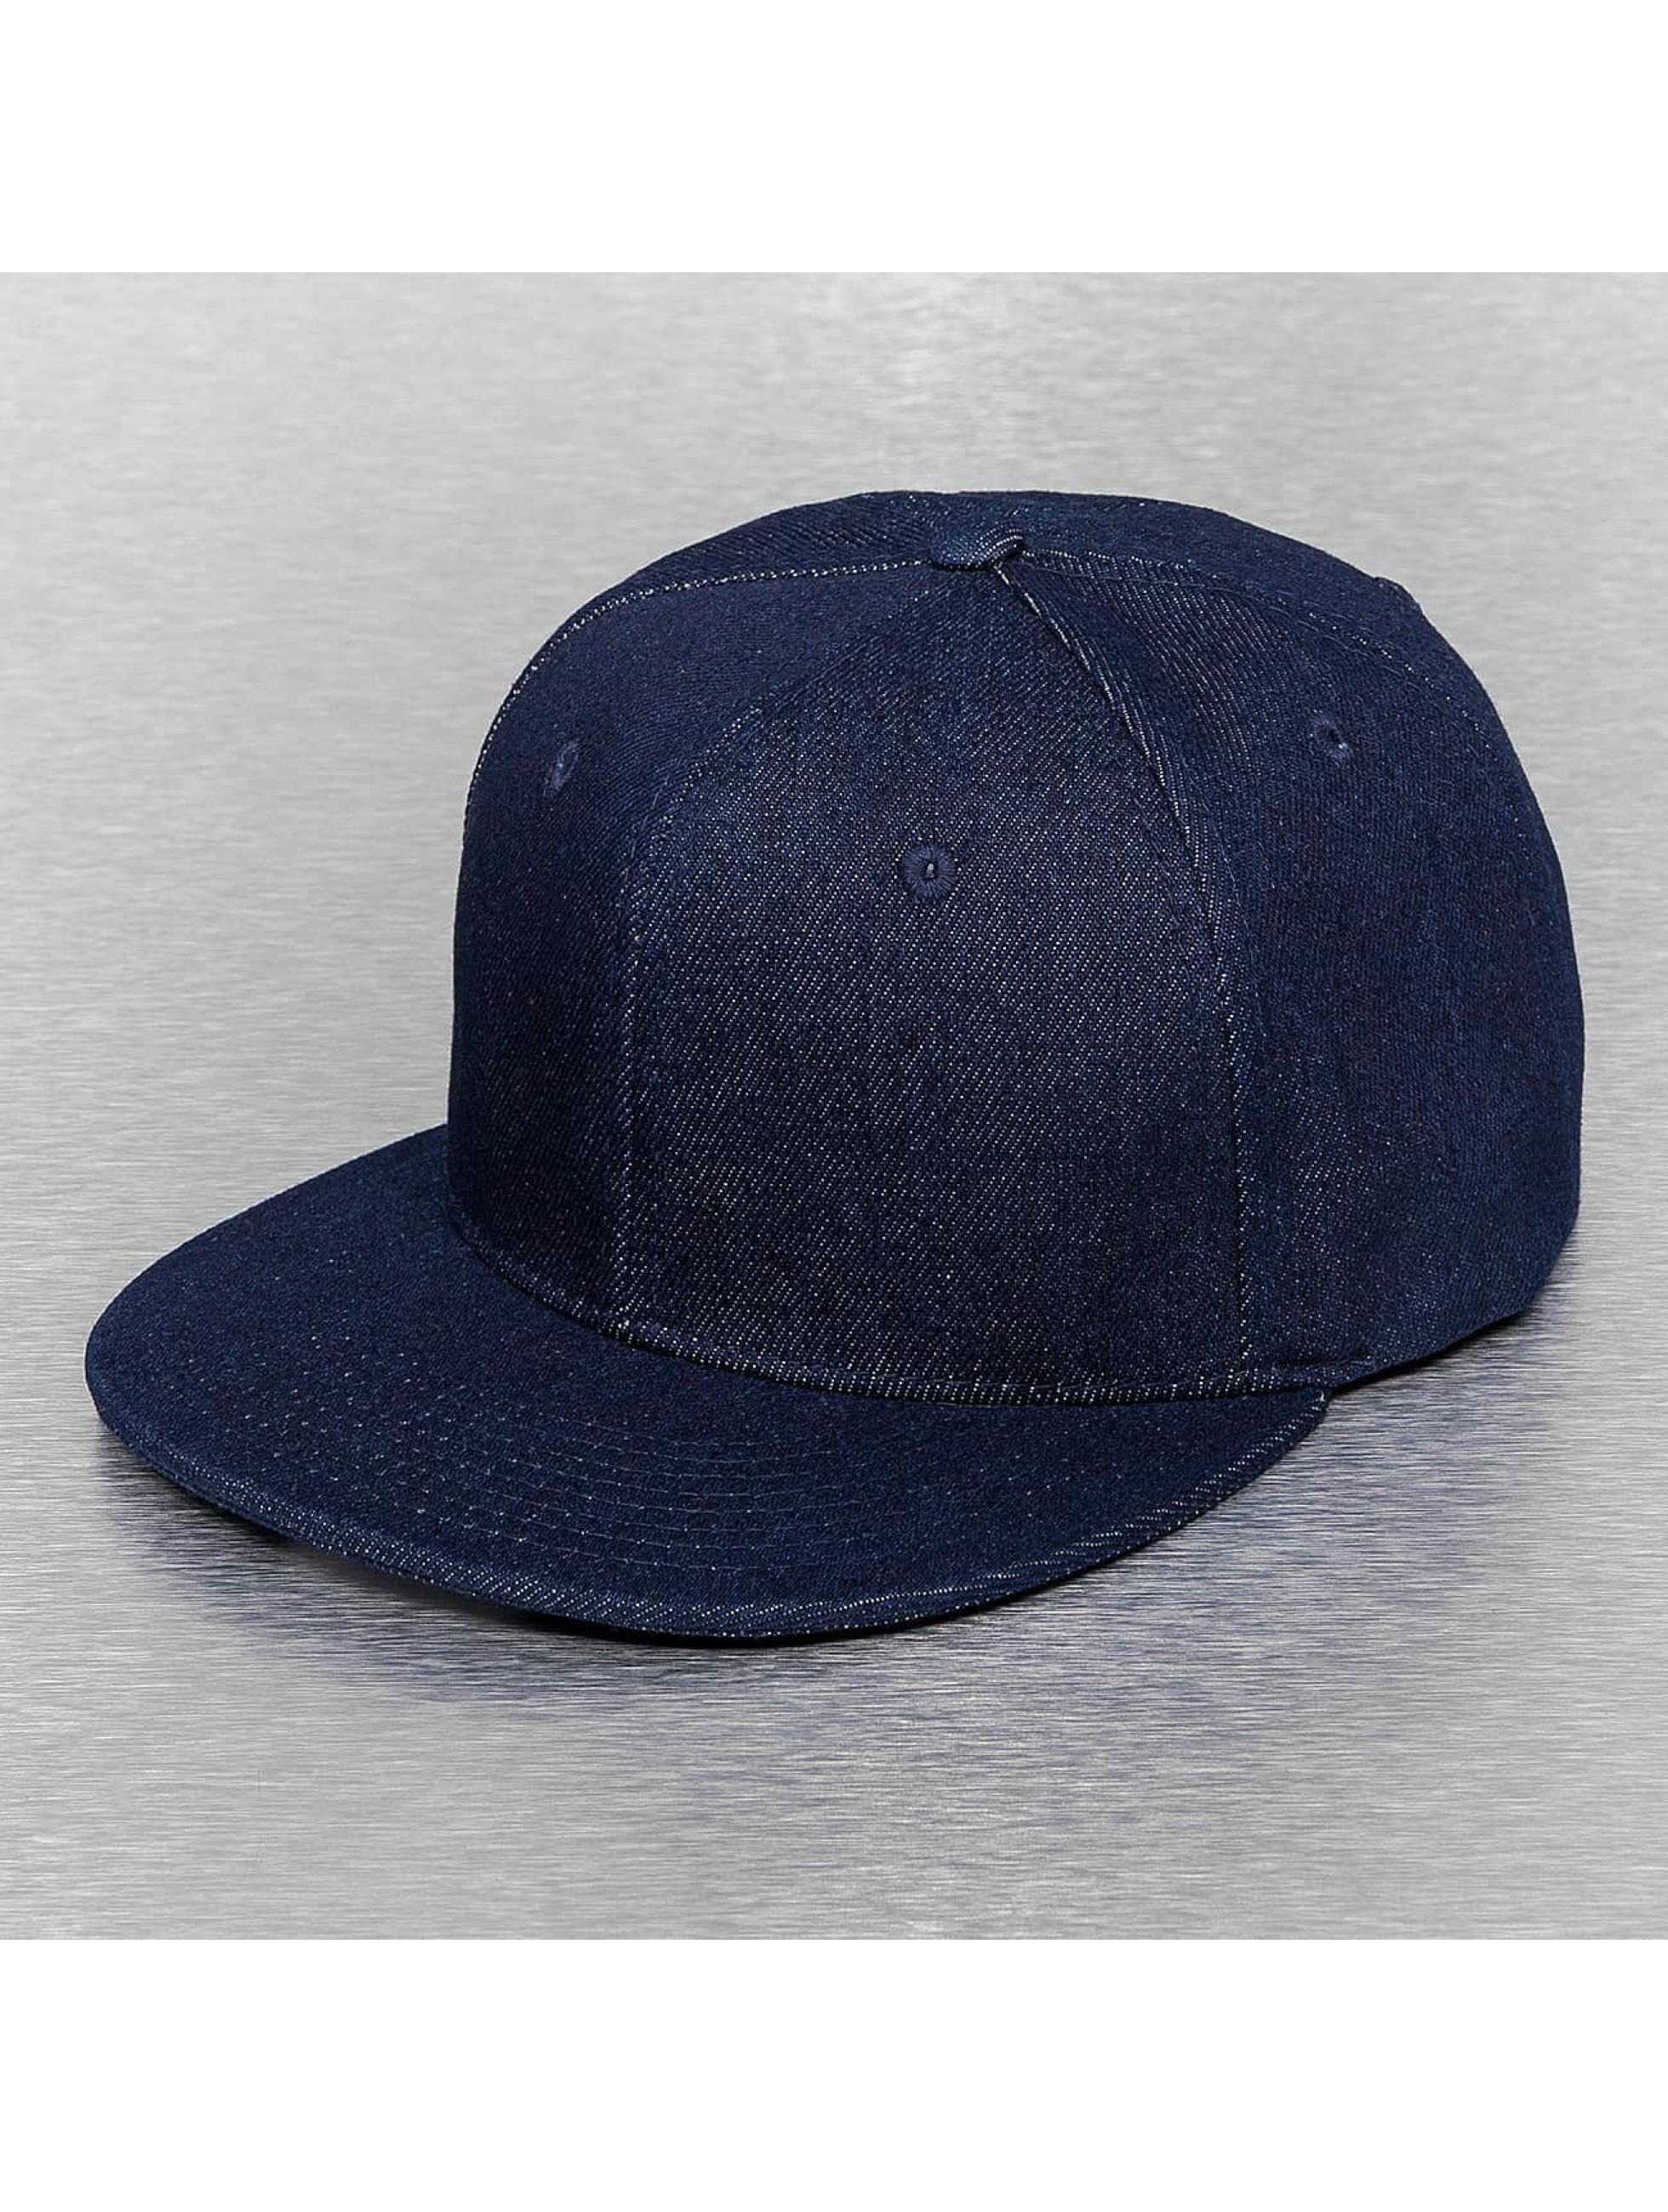 Cap Crony Männer,Frauen Snapback Cap Denim in blau